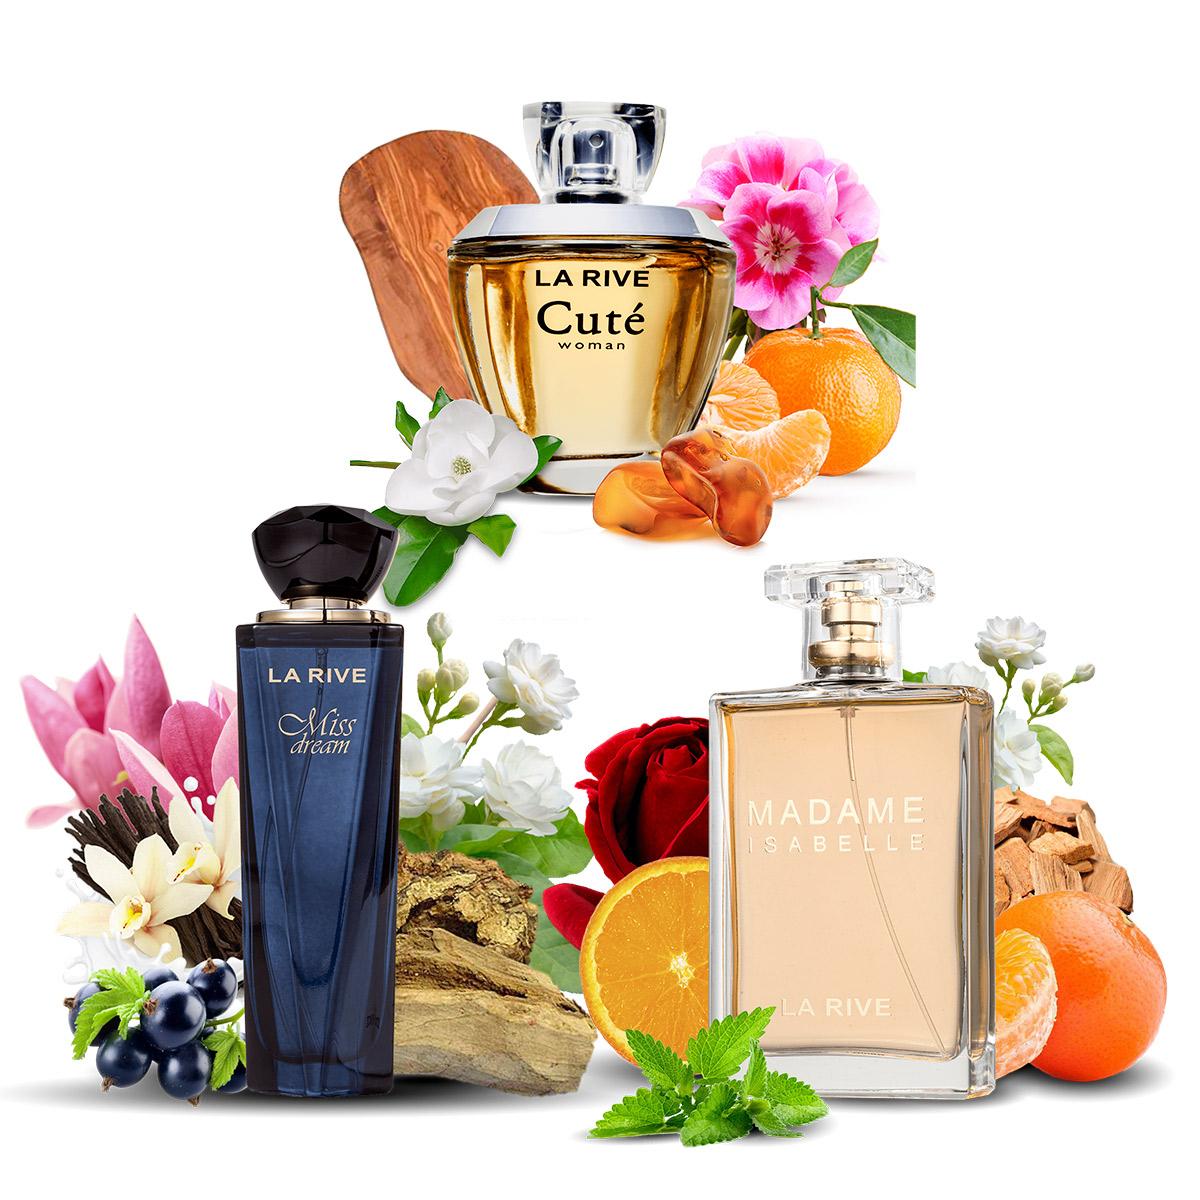 Kit 10 Perfumes Importados La Rive Atacado Mais Vendidos  - Mercari Perfumes